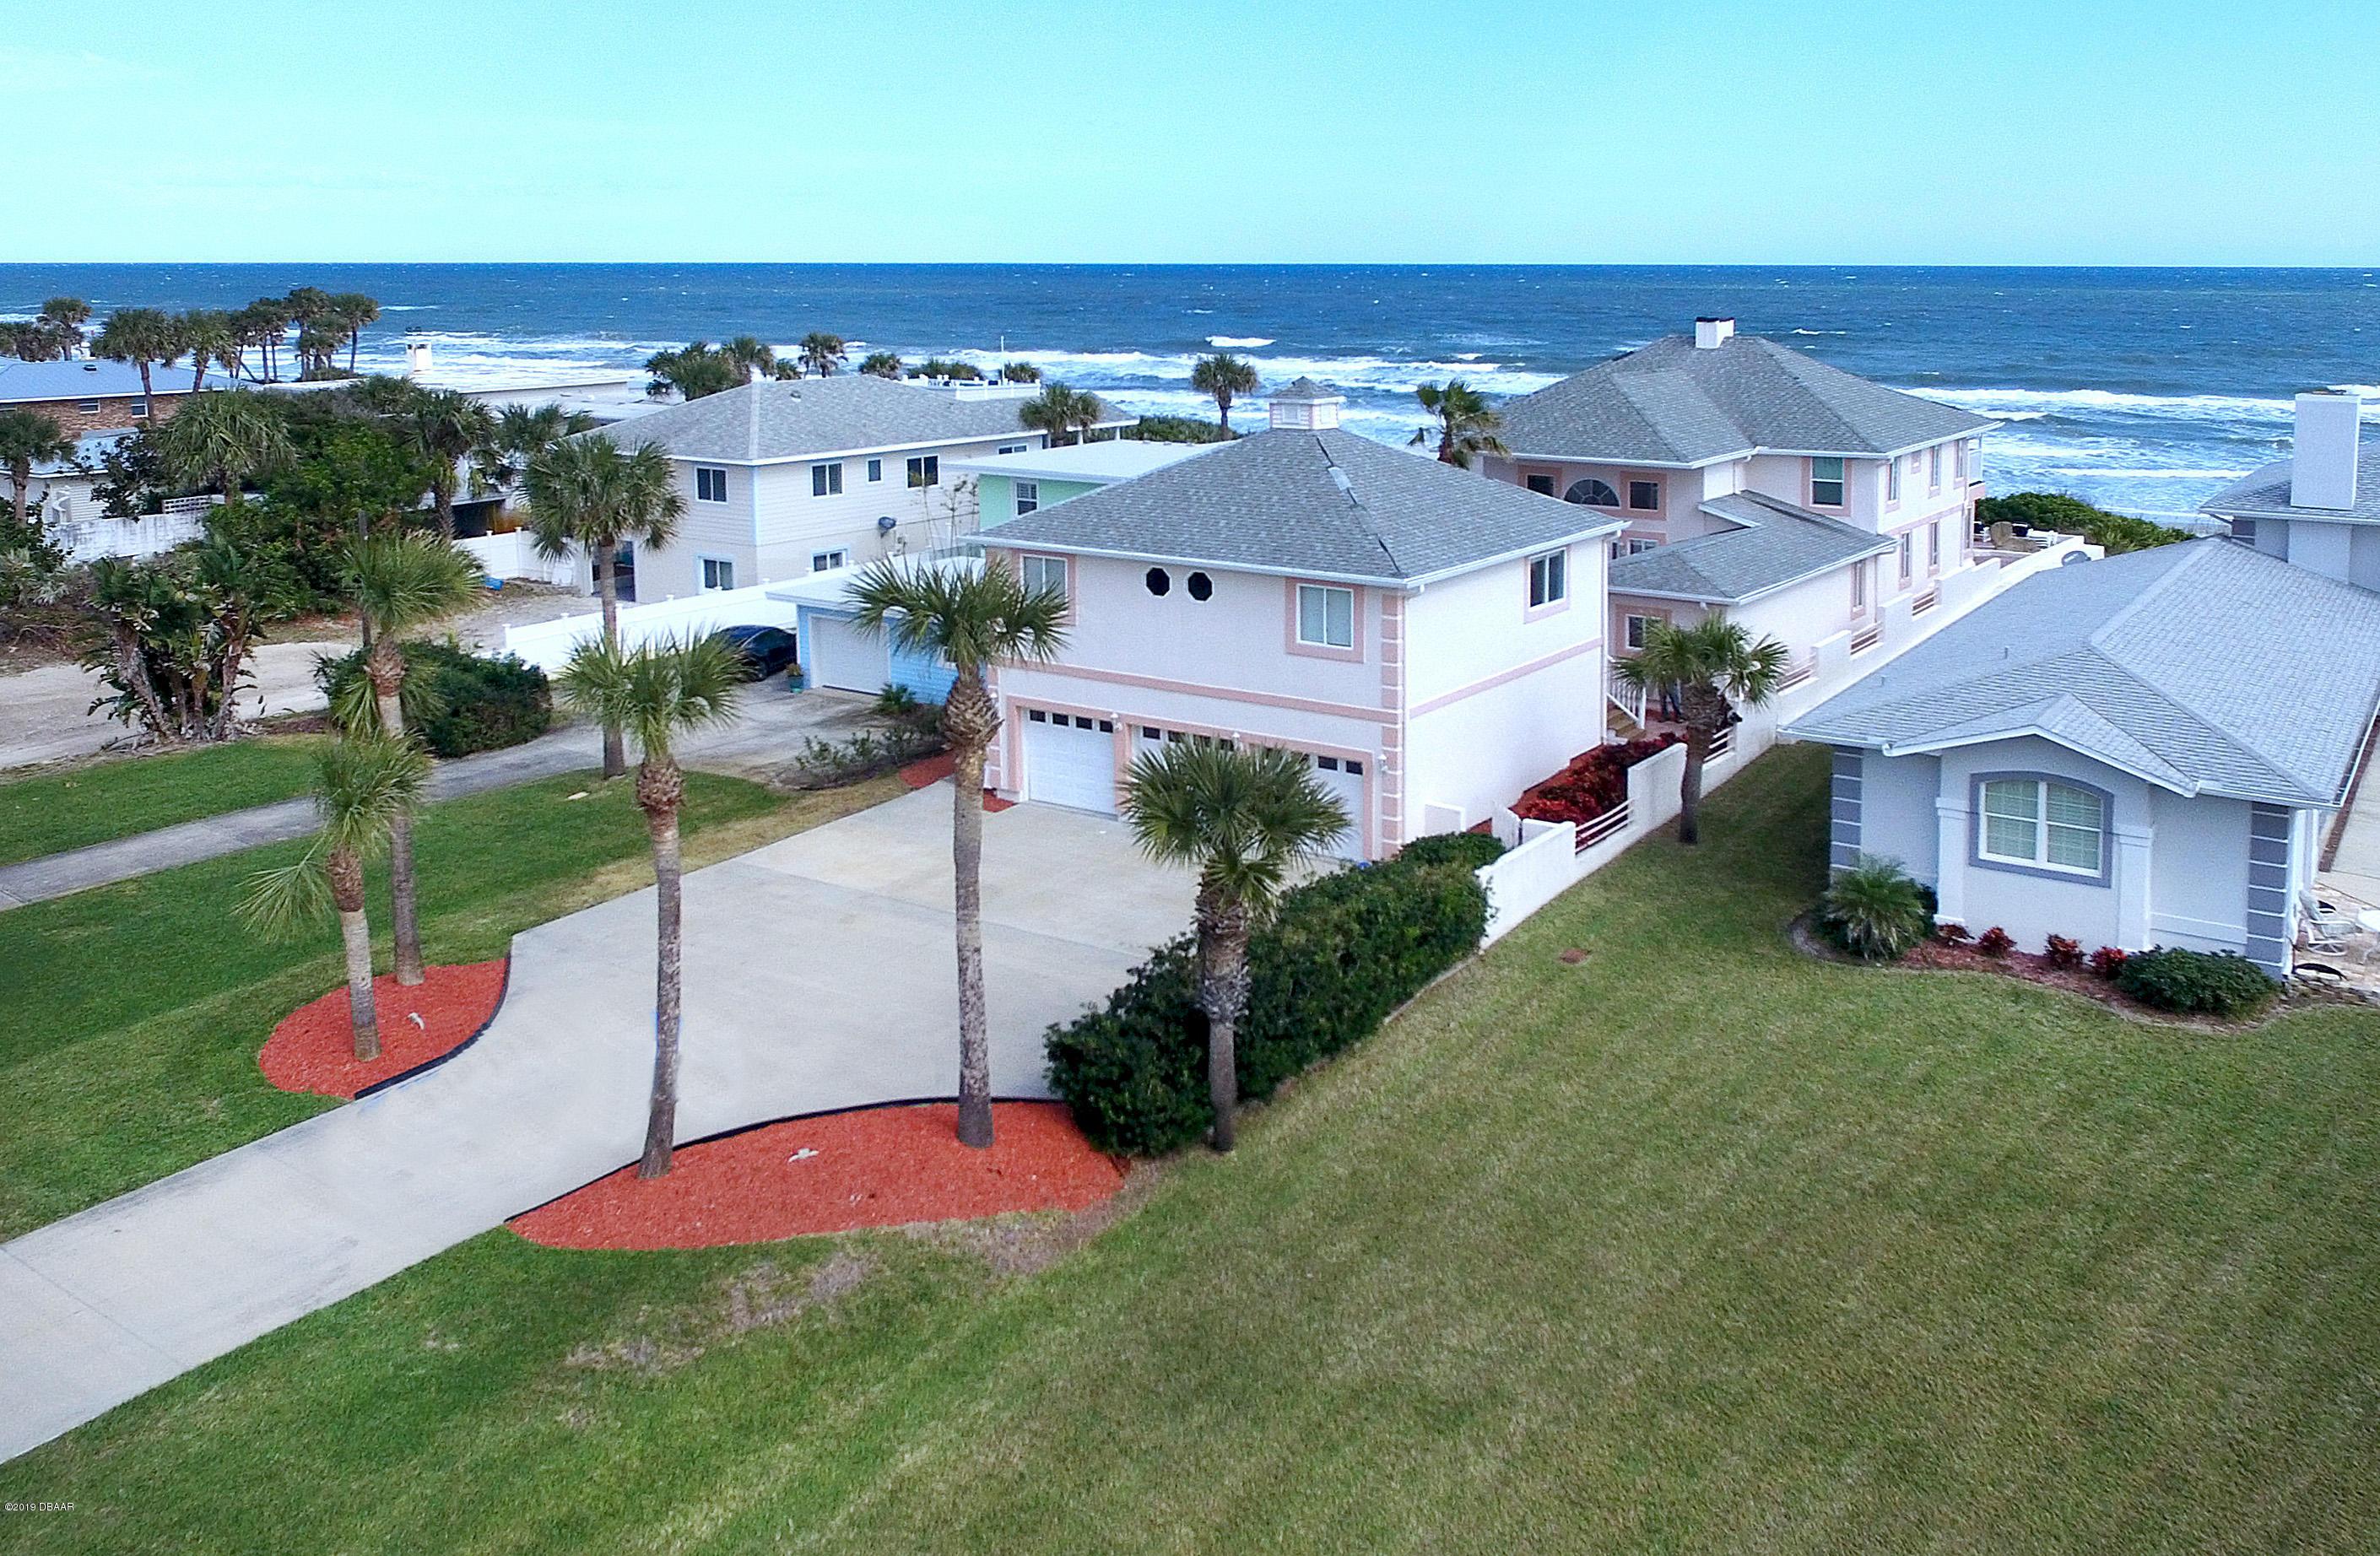 Photo of 2721 S Atlantic Avenue, Daytona Beach Shores, FL 32118